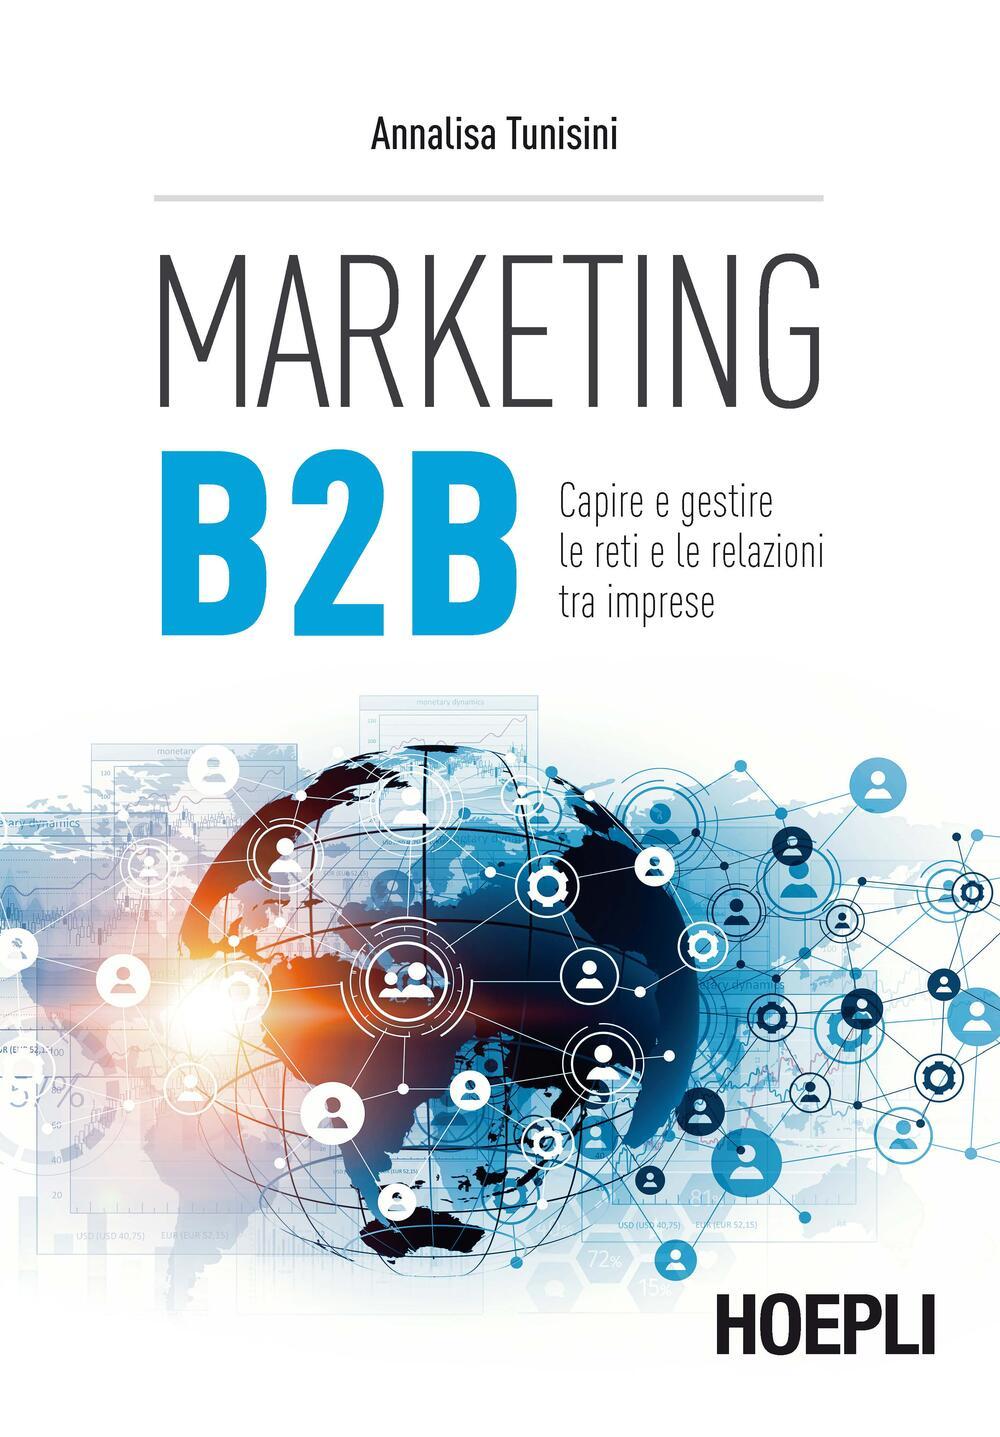 Marketing B to Libro B Annalisa Tunisini Libro to Hoepli Marketing   IBS d0fd1f